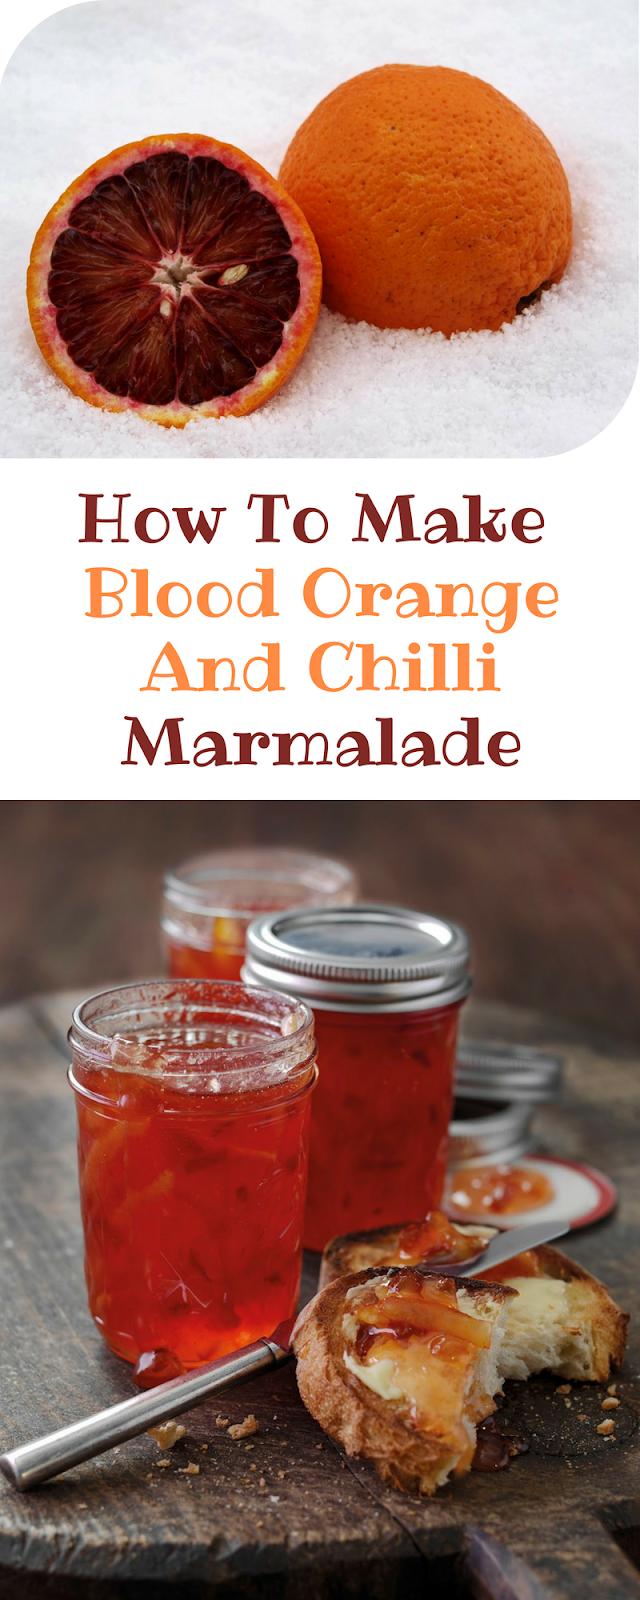 Blood Orange And Chilli Marmalade.